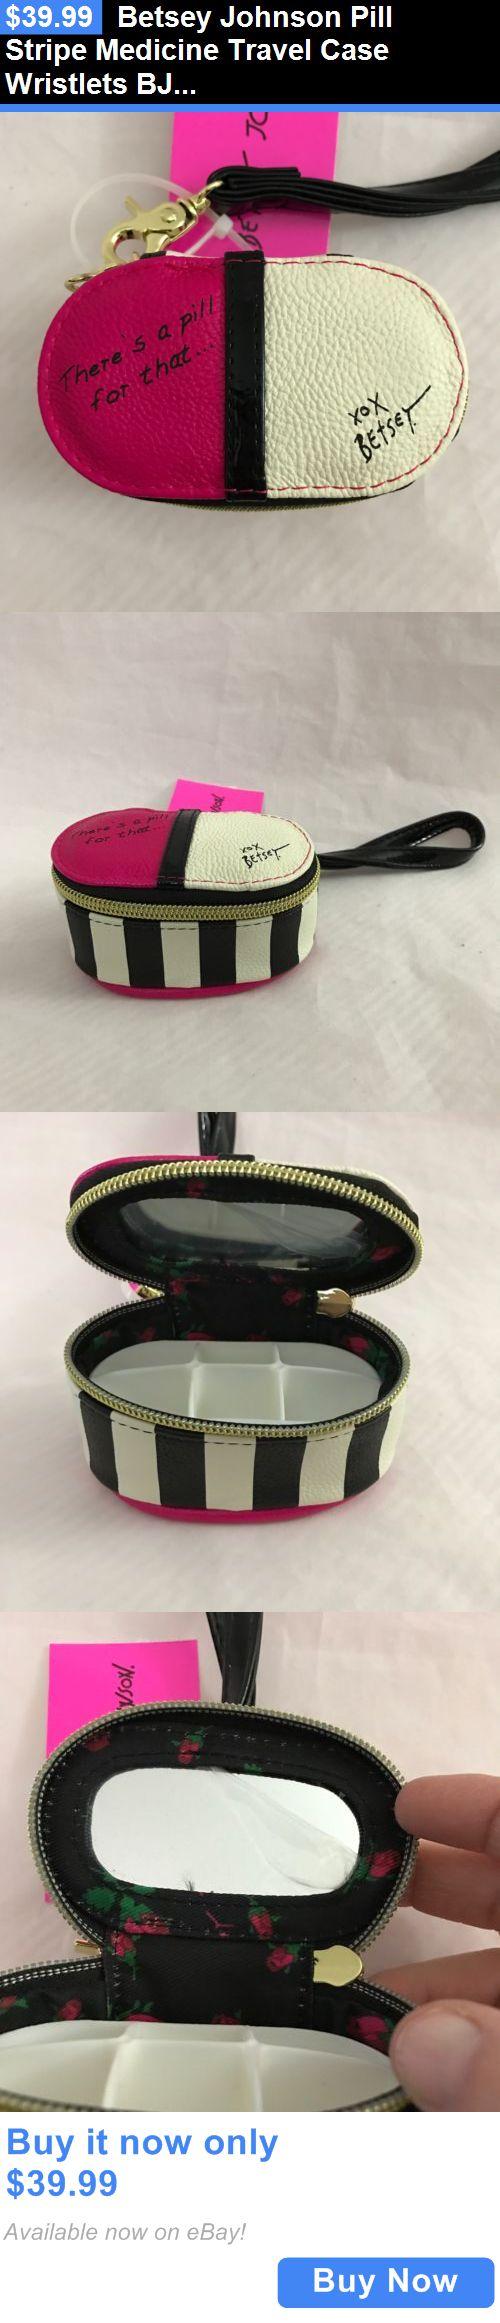 Contact Lens Cases: Betsey Johnson Pill Stripe Medicine Travel Case Wristlets Bj56095p Prescription BUY IT NOW ONLY: $39.99